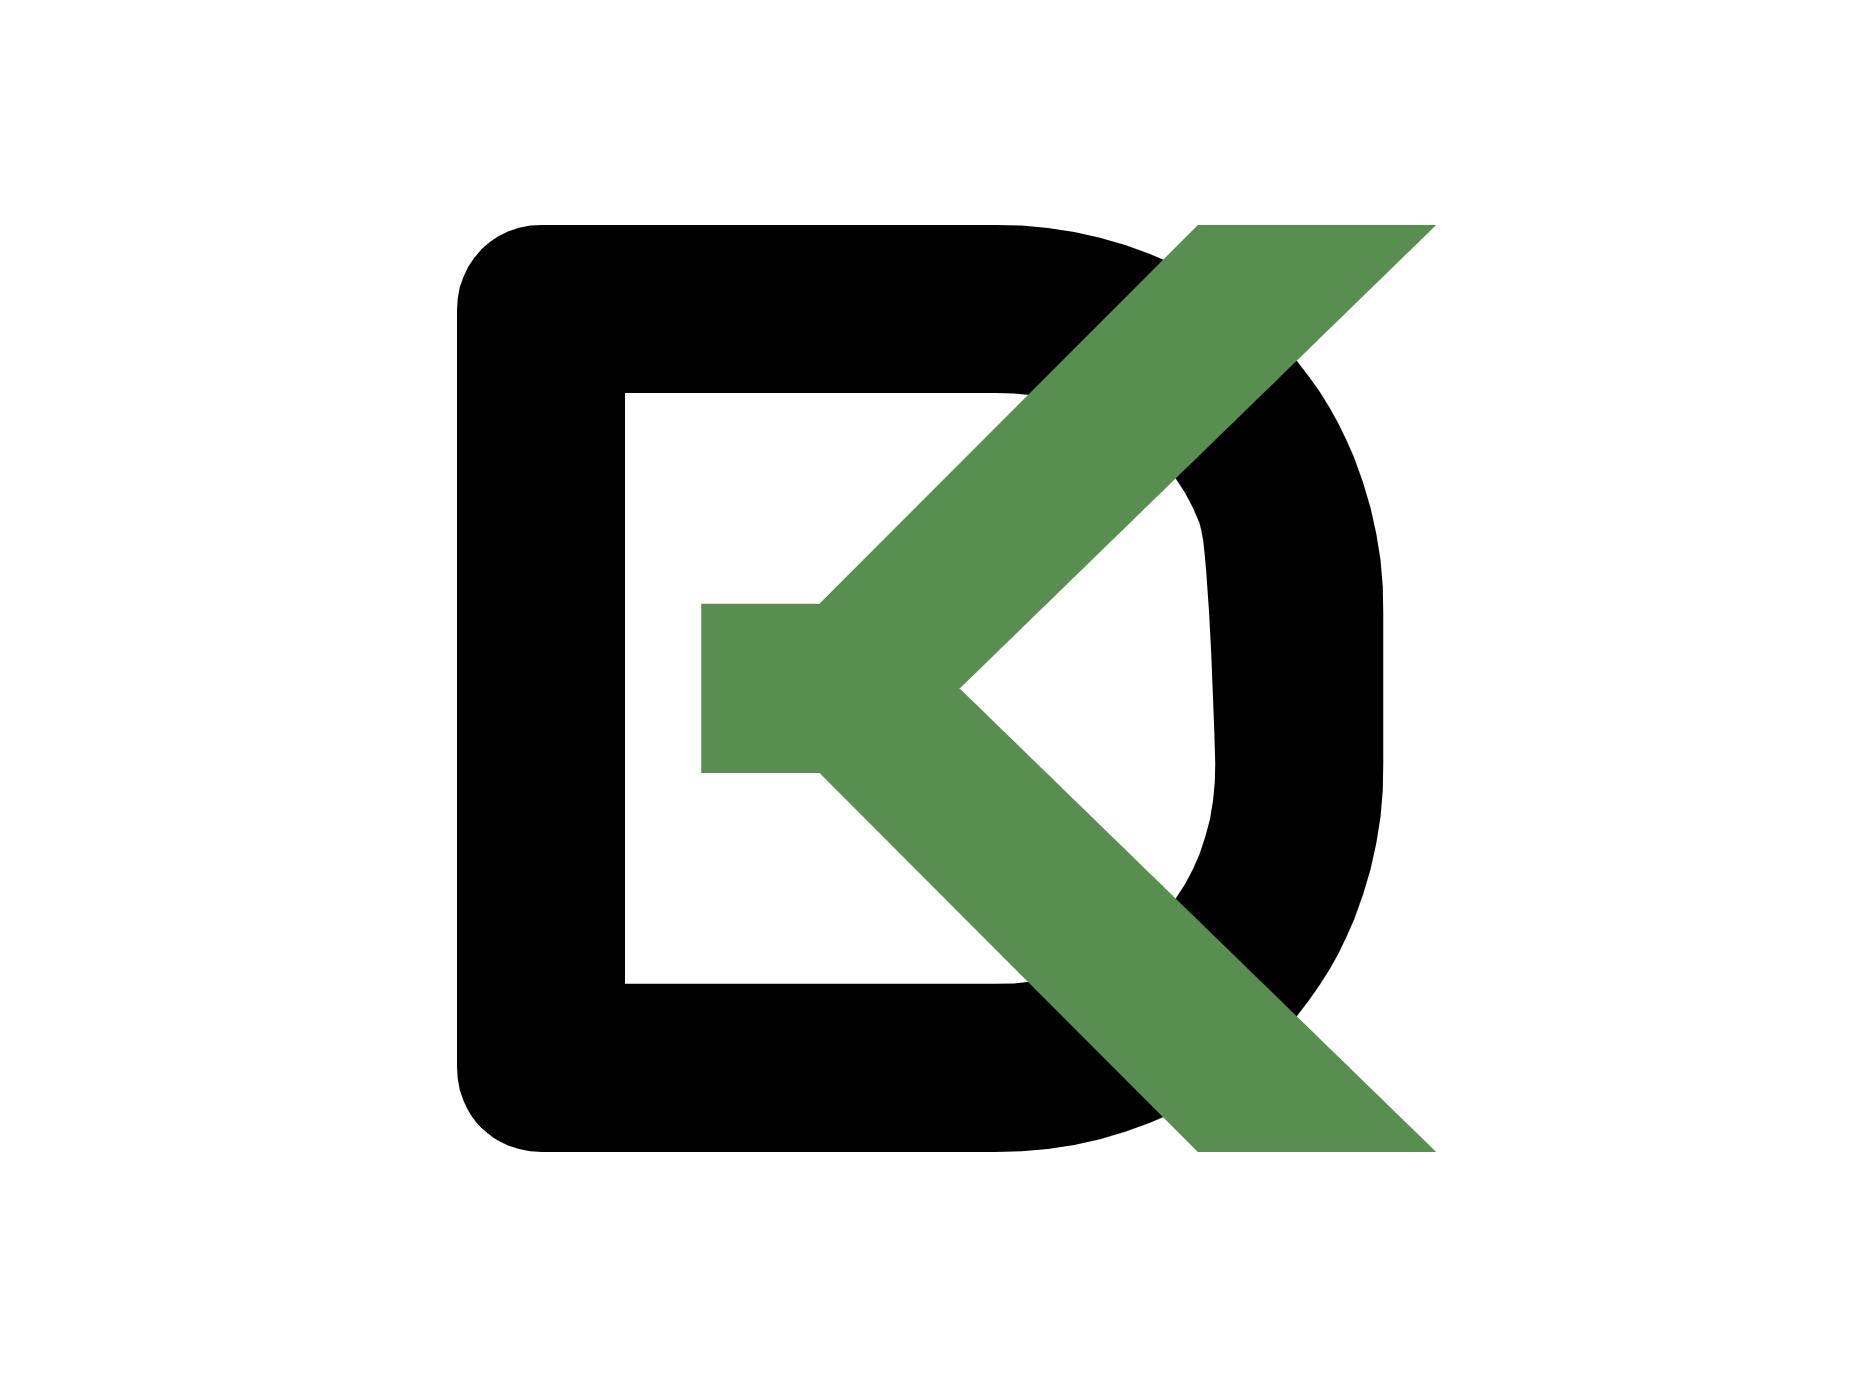 DK логотип